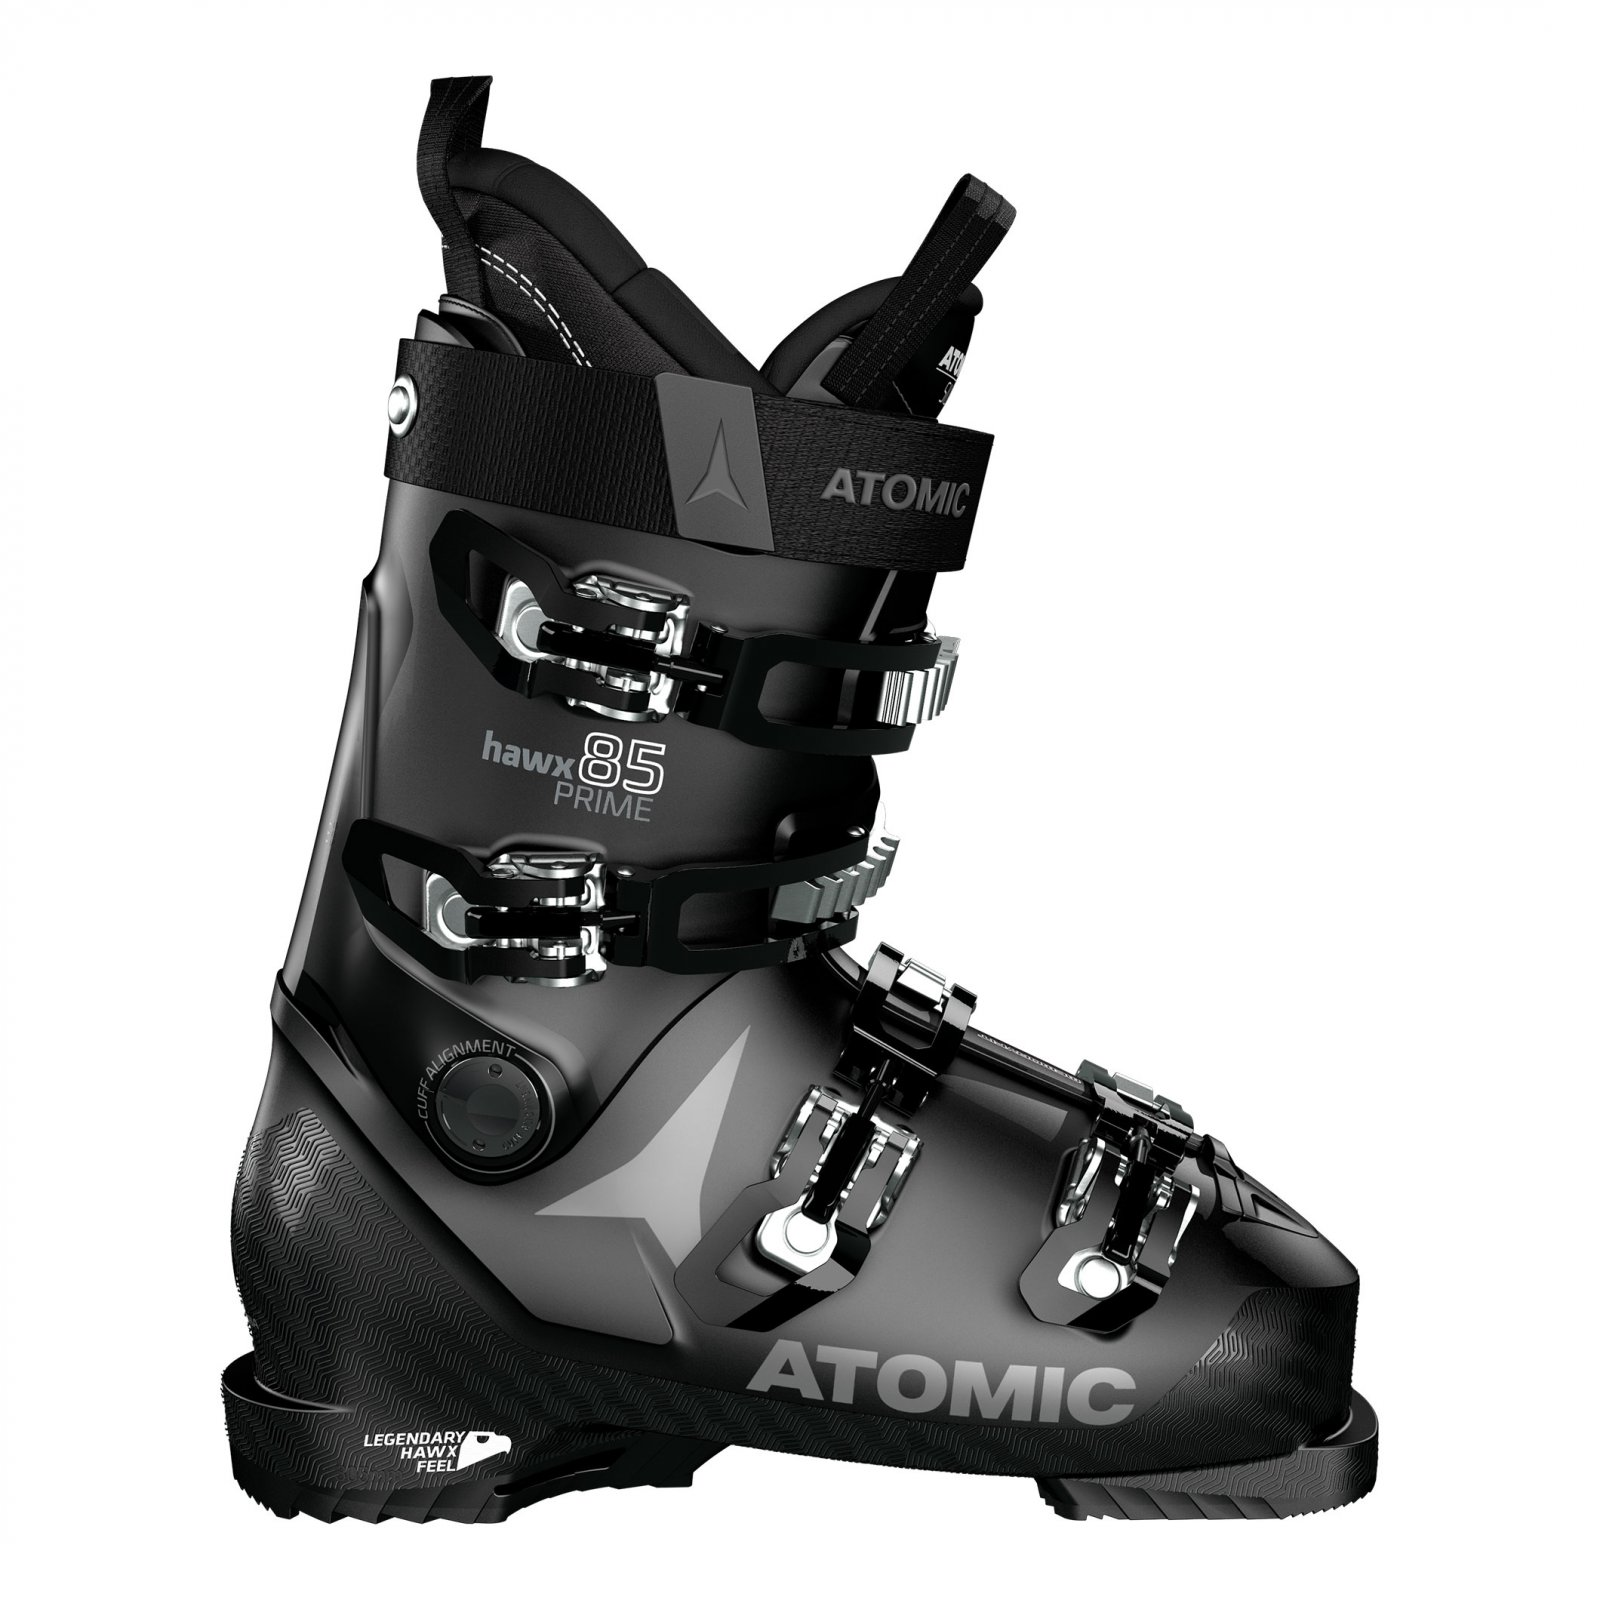 2021 Atomic Hawx Prime 85 Women's Ski Boots